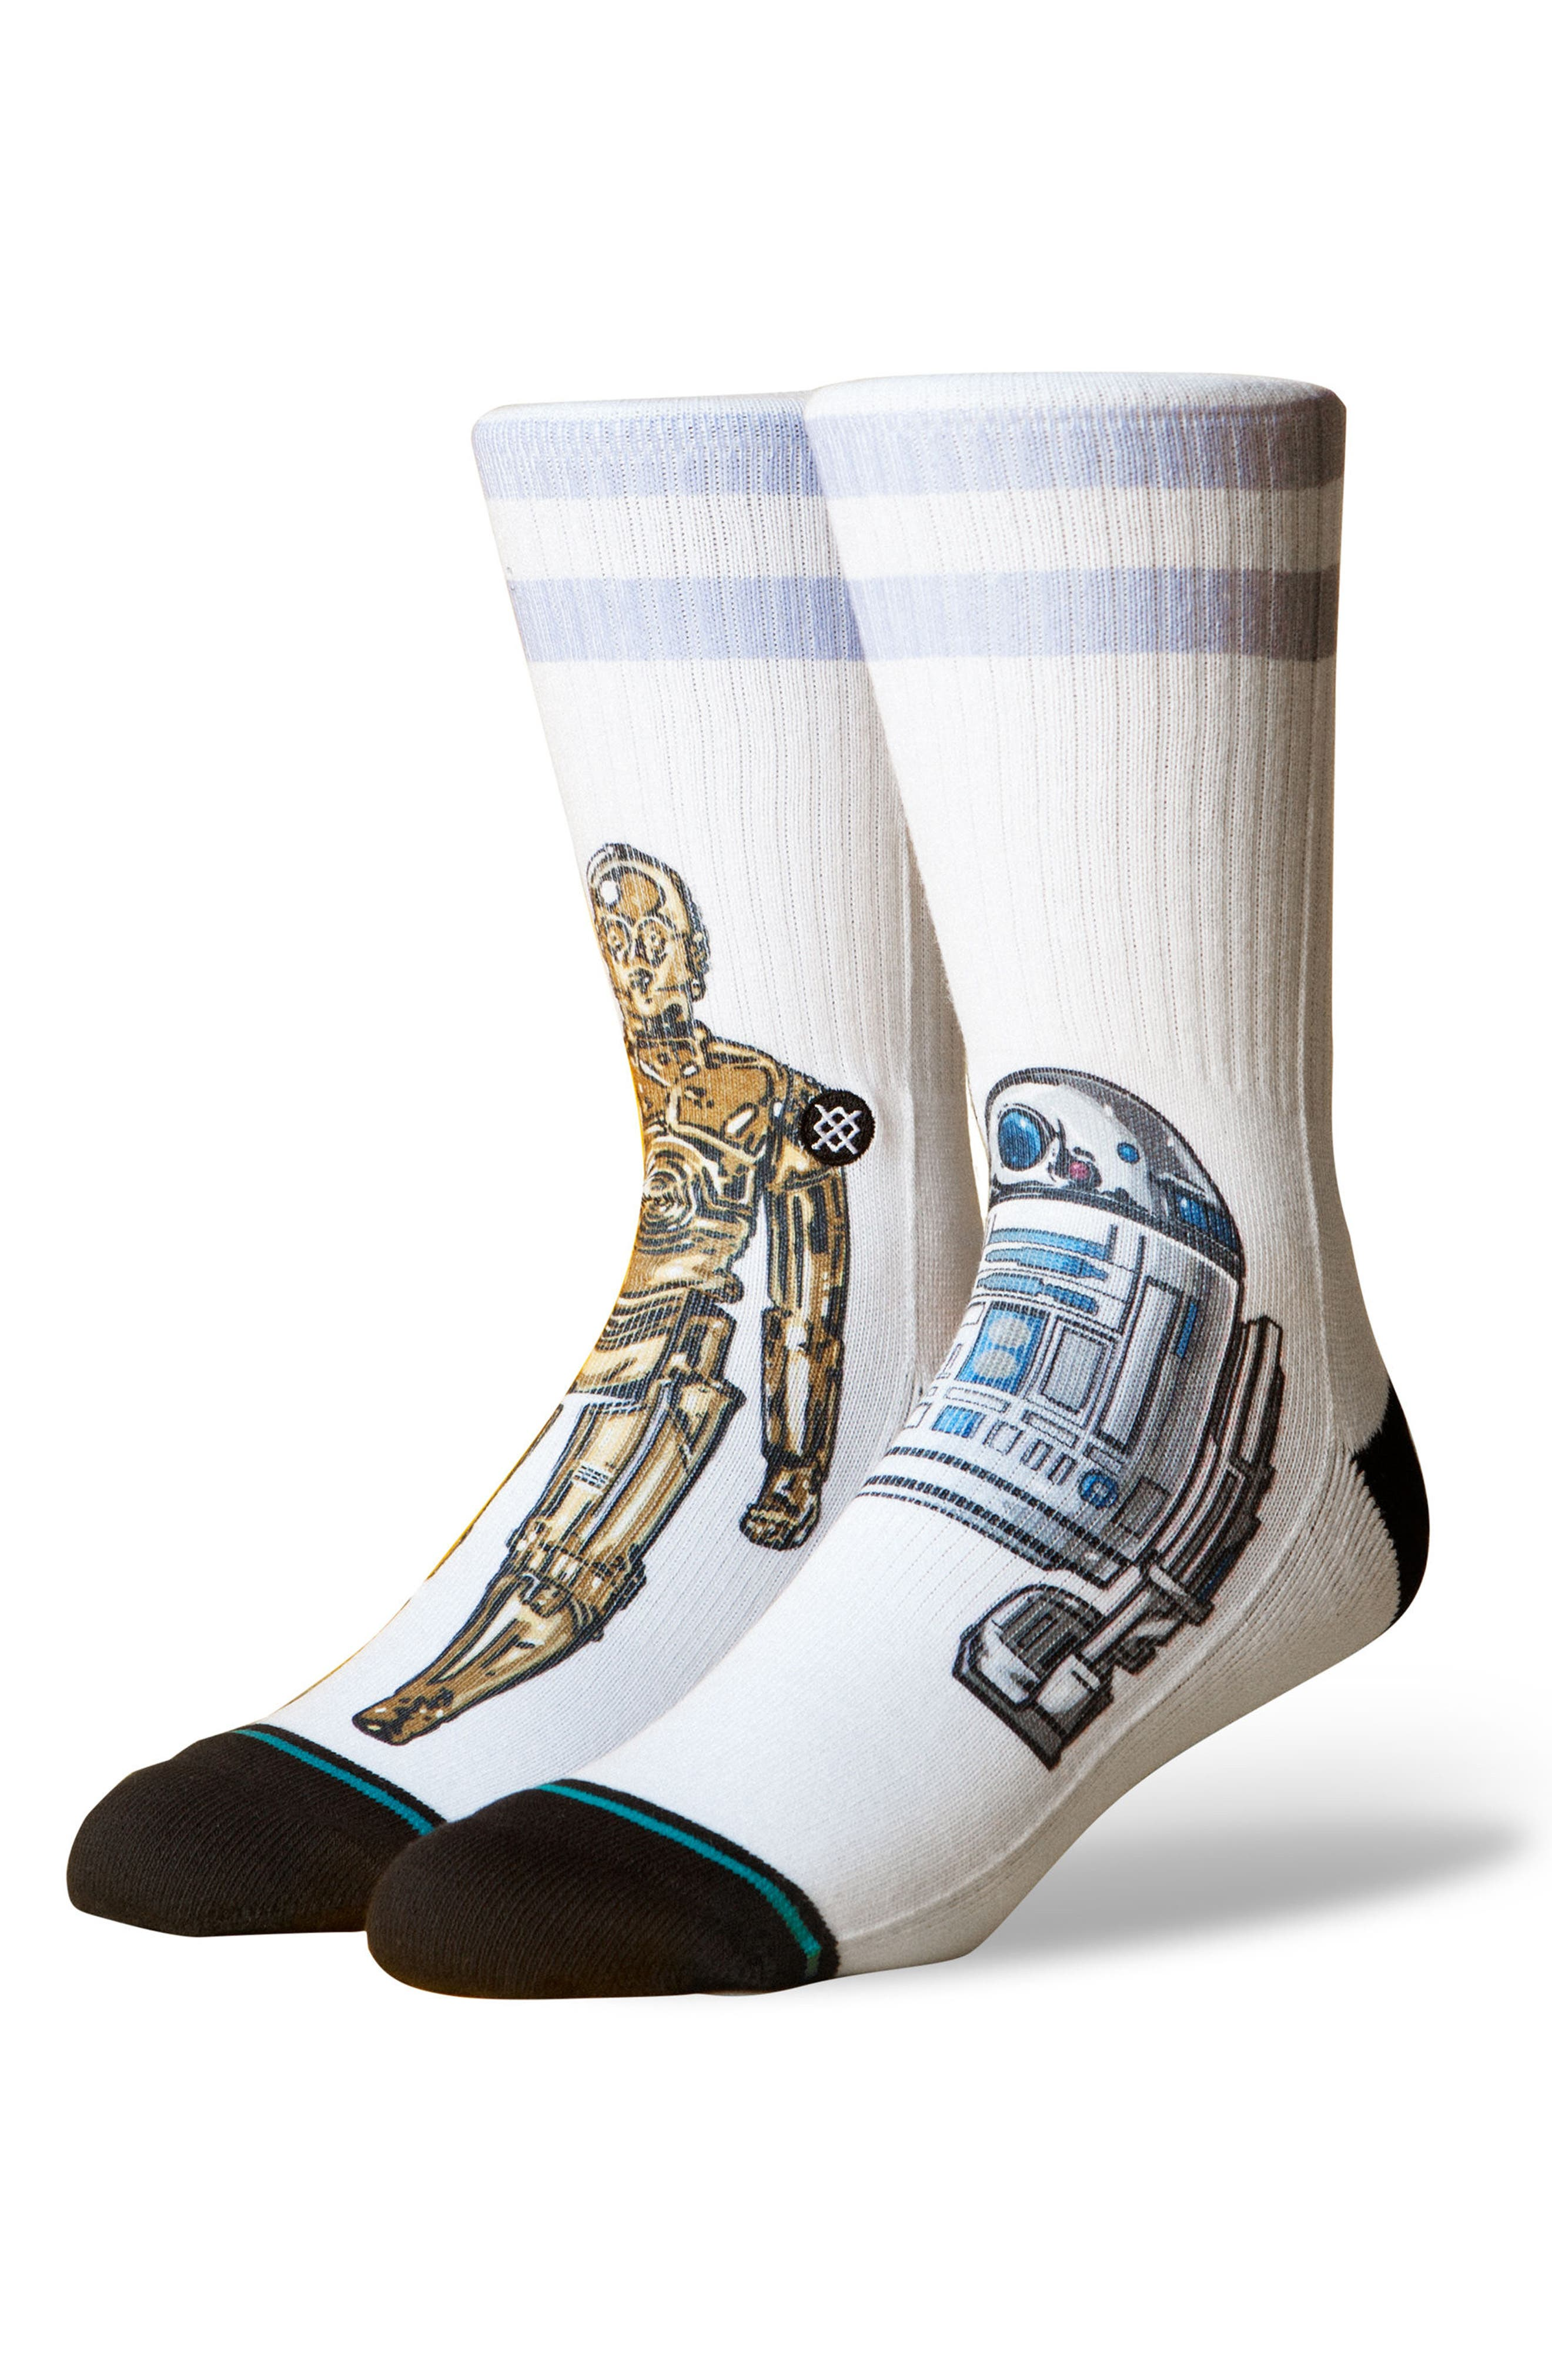 Main Image - Stance Star Wars™ Prime Condition Socks